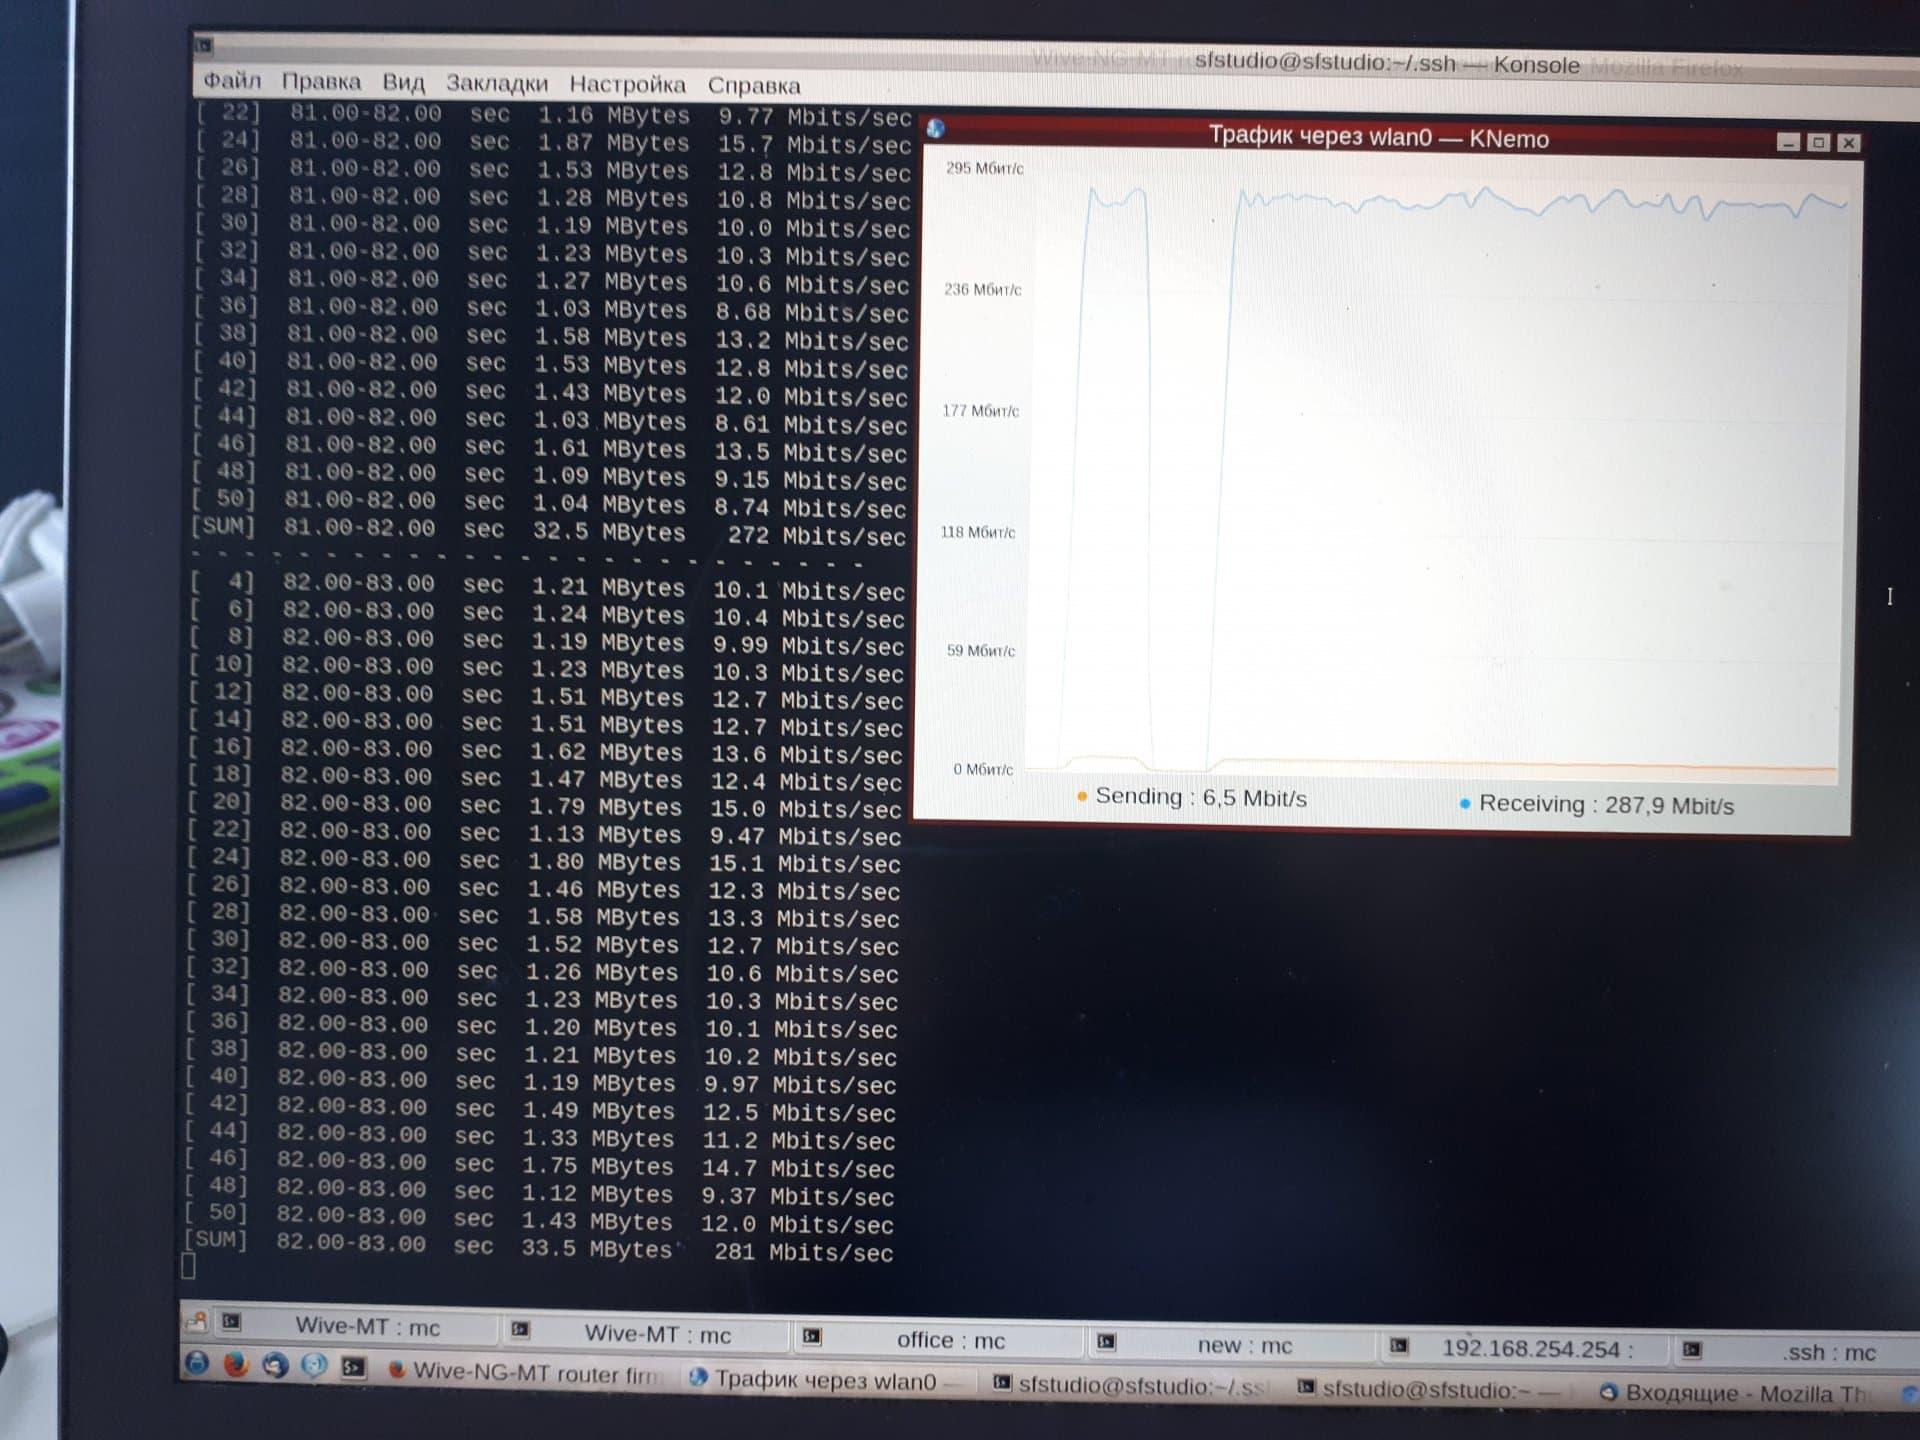 Intel 7260, 80МГц, Max Rate 433Mbit - iperf